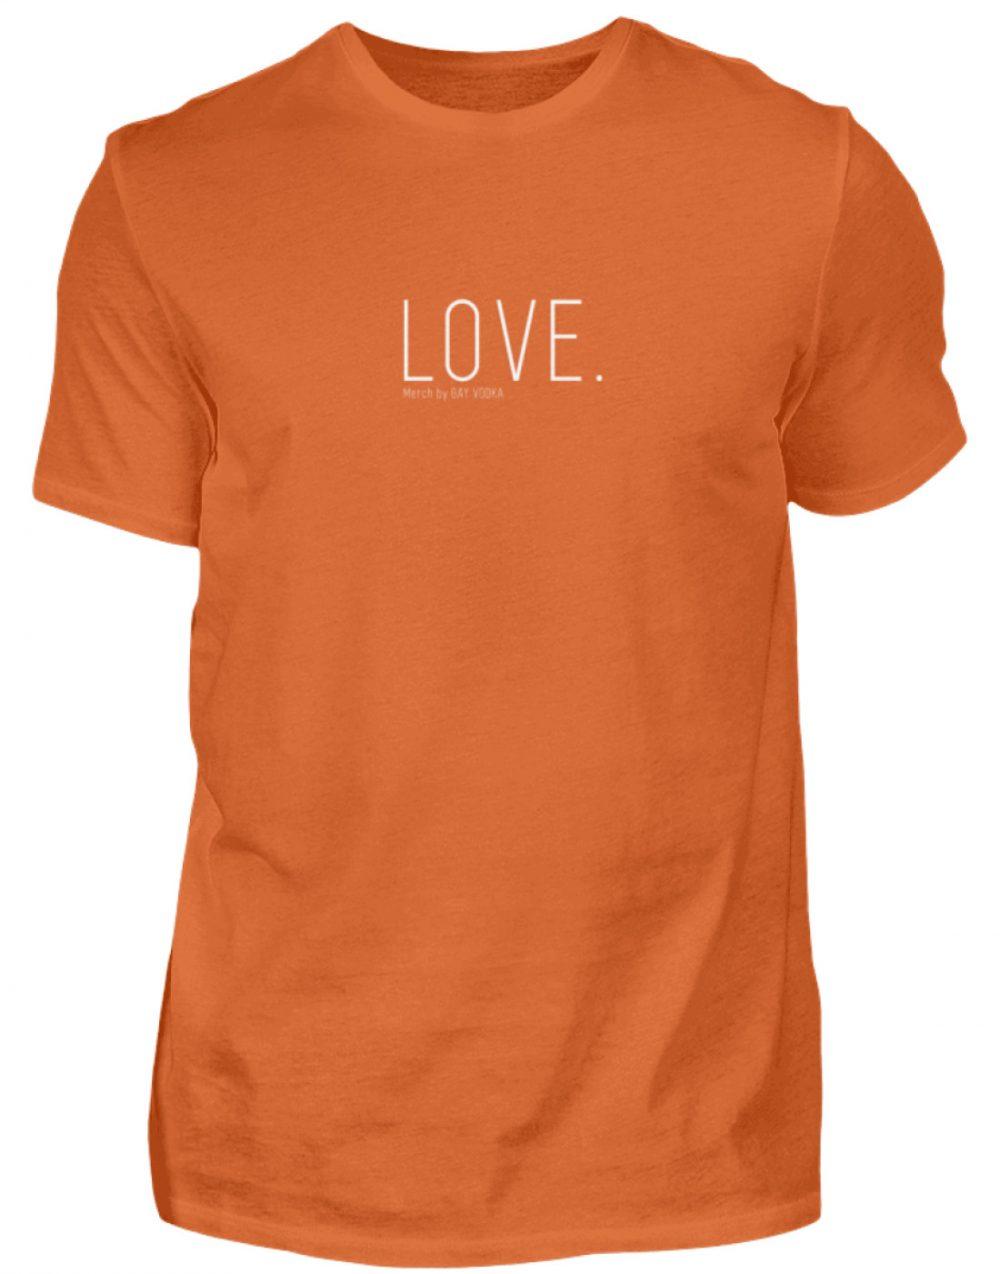 LOVE. - Herren Premiumshirt-2953